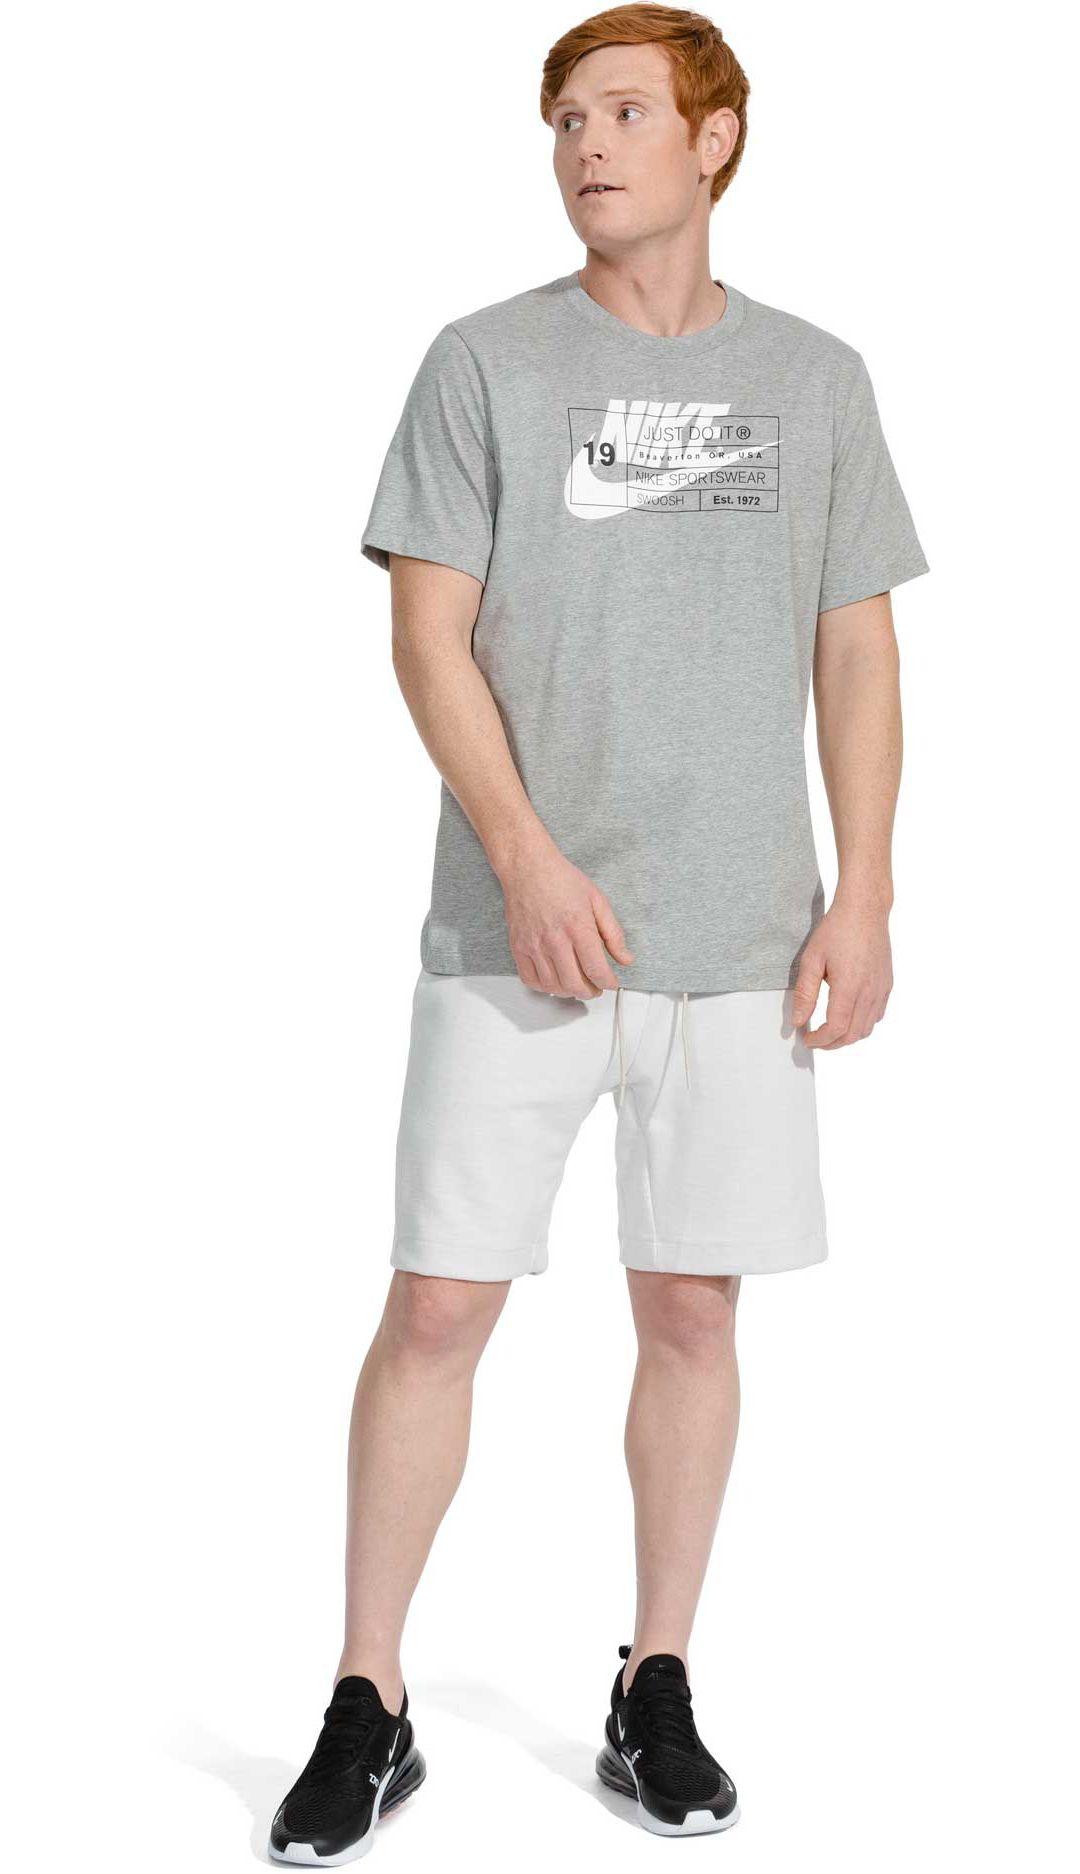 563c34576bb9 Nike Men's Sportswear Story Graphic Tee | DICK'S Sporting Goods